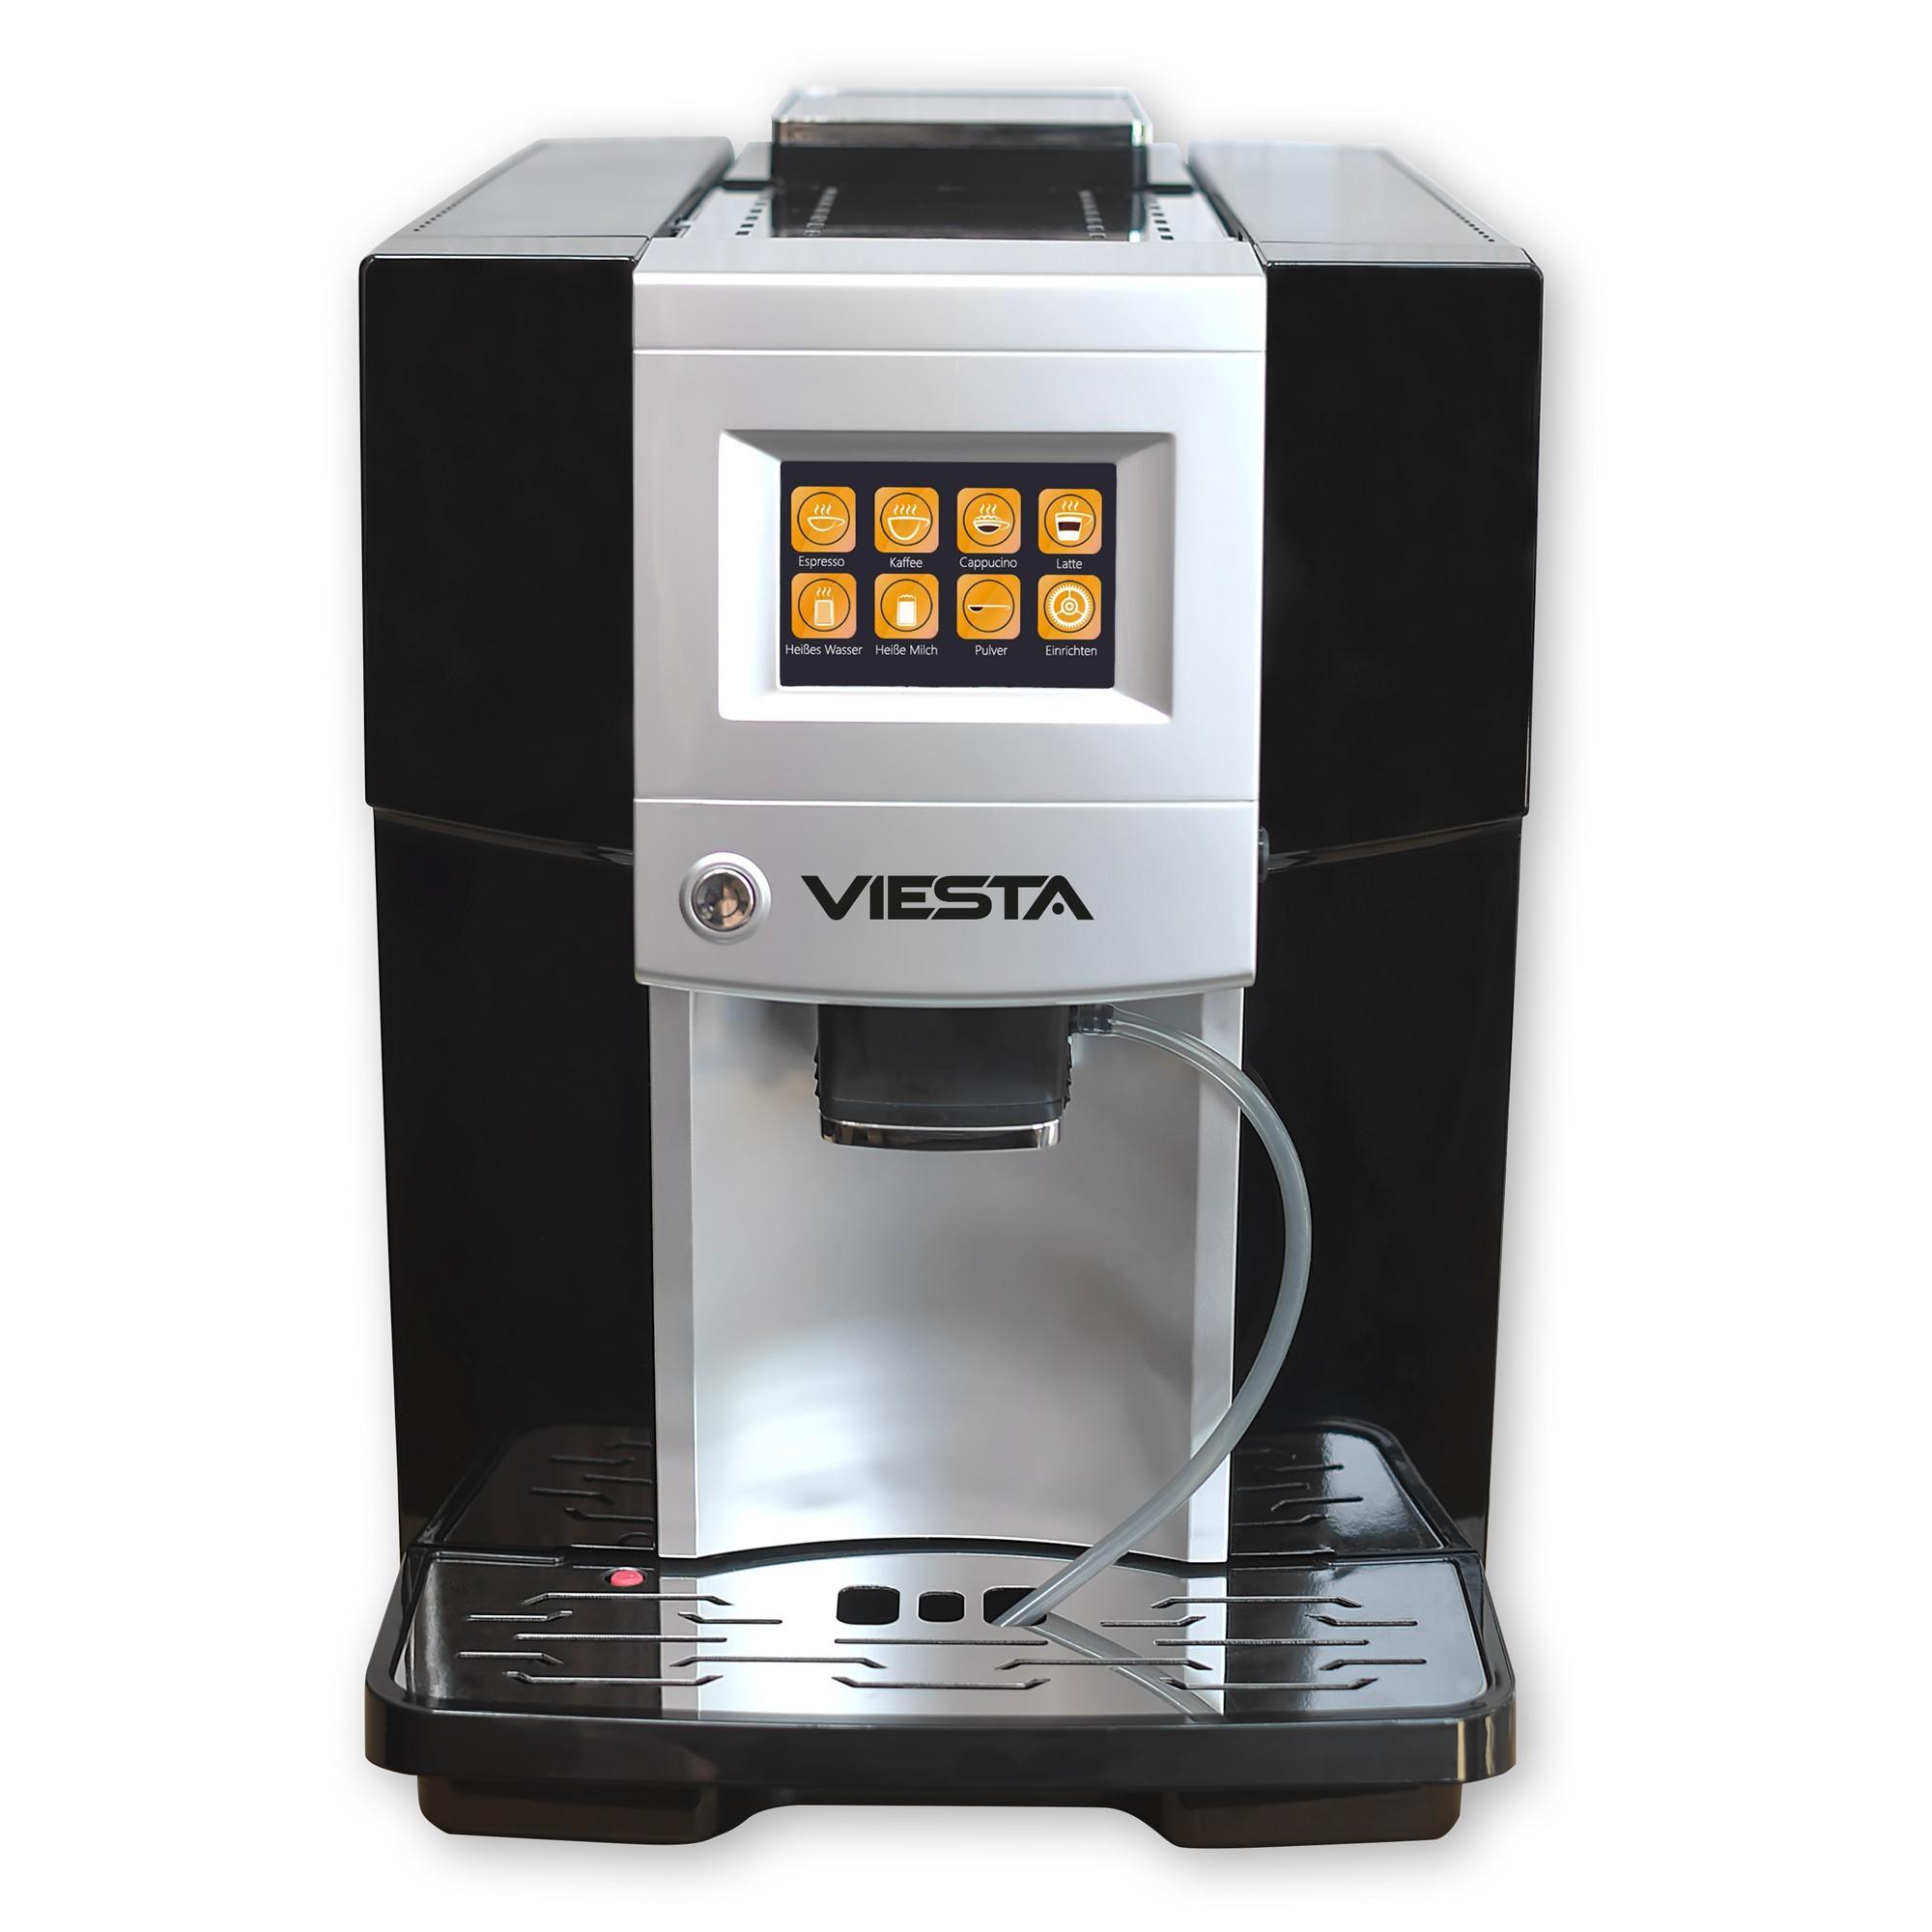 viesta one touch 500 kaffeevollautomat kaffeeautomat. Black Bedroom Furniture Sets. Home Design Ideas